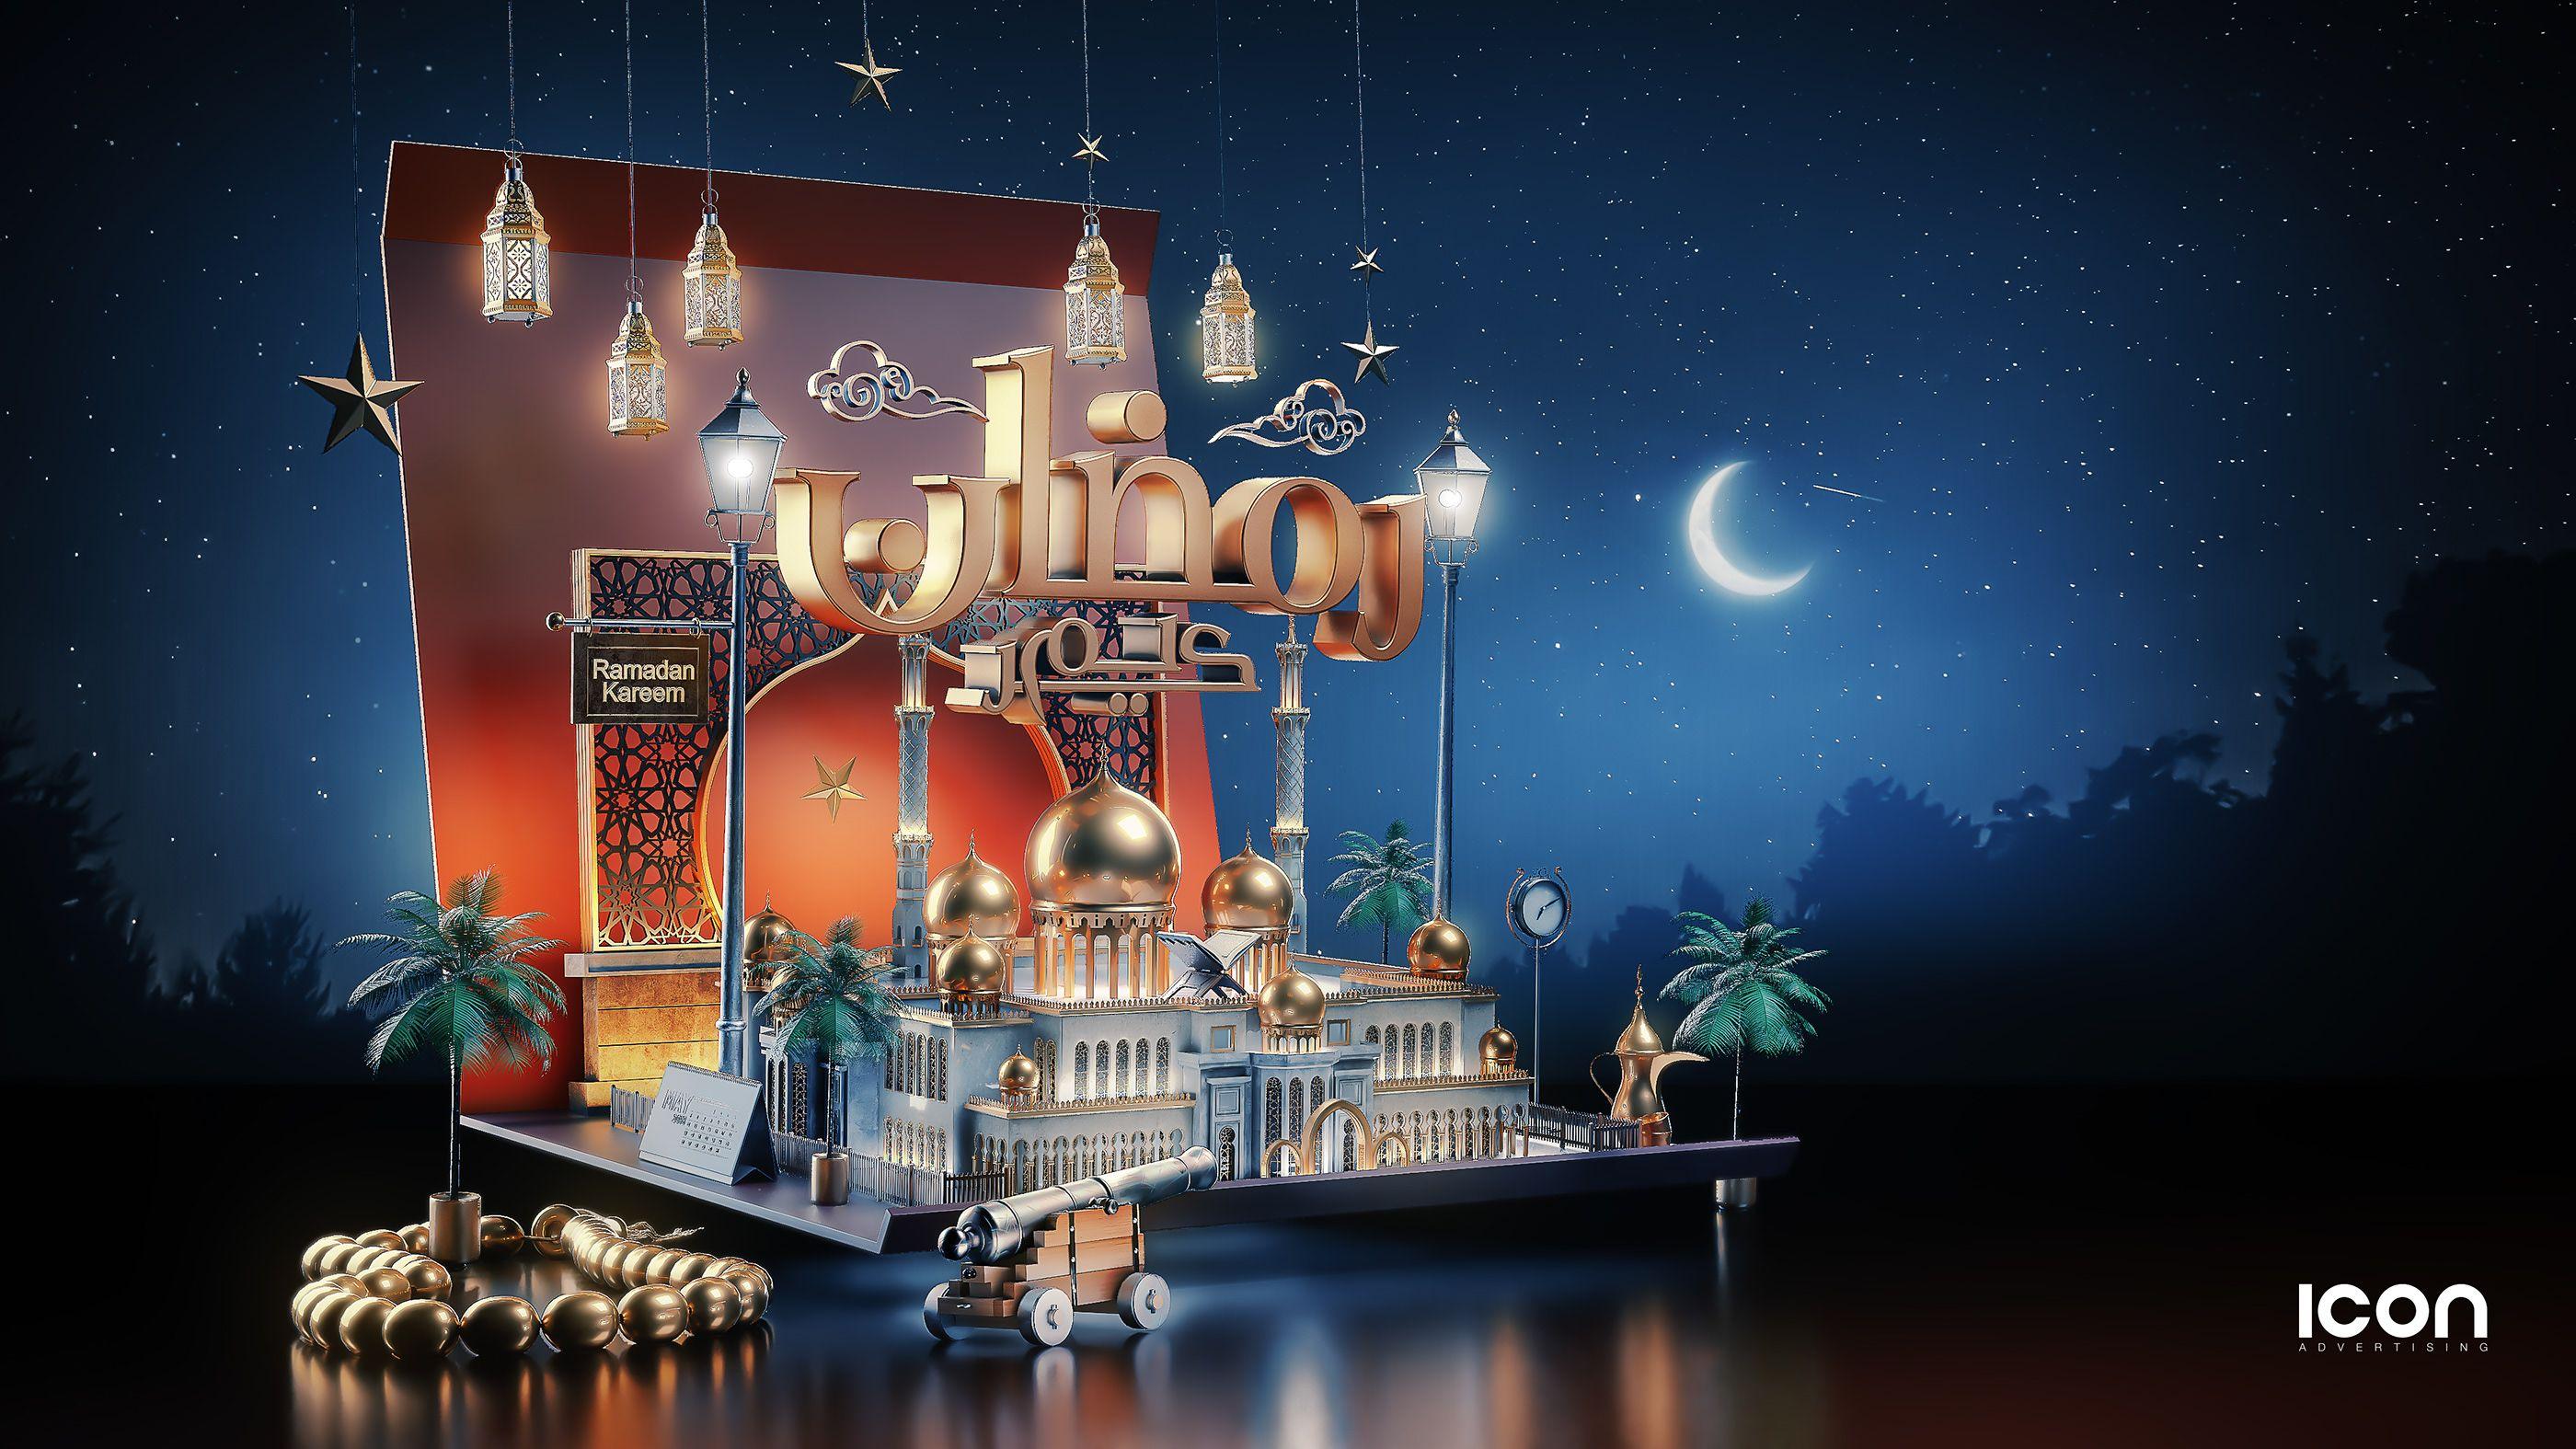 Ramadan Kareem Icon Cgi 3d Modeling Motion Graphics On Behance Ramadan Kareem Ramadan Creative Posters